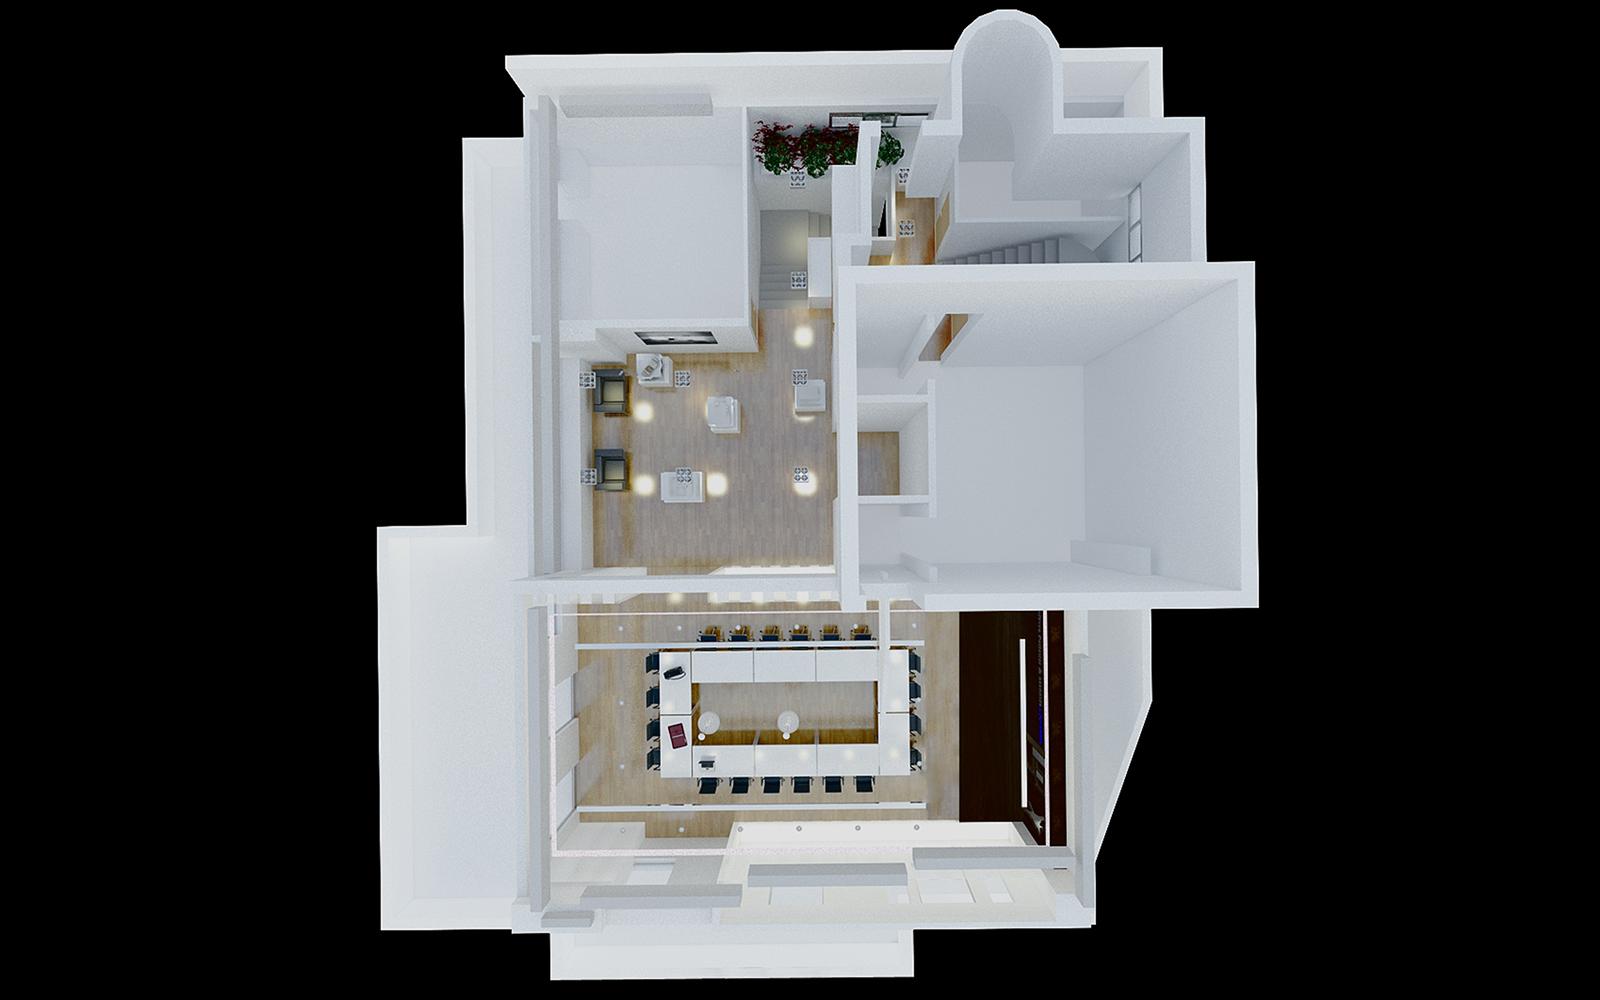 planta_oficinas_1600x1000